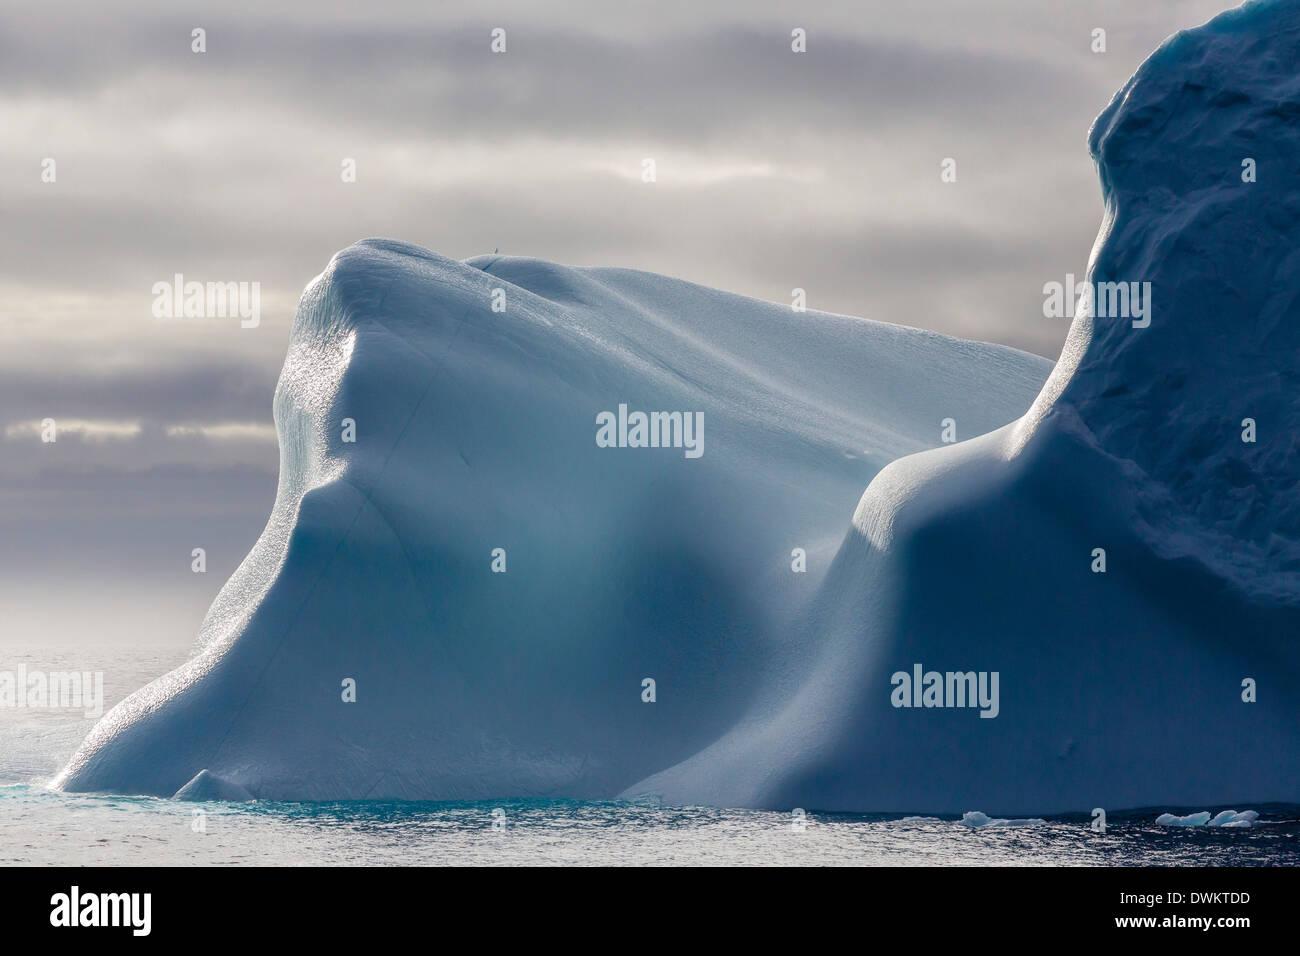 Huge iceberg in Baffin Bay, Nunavut, Canada, North America Stock Photo